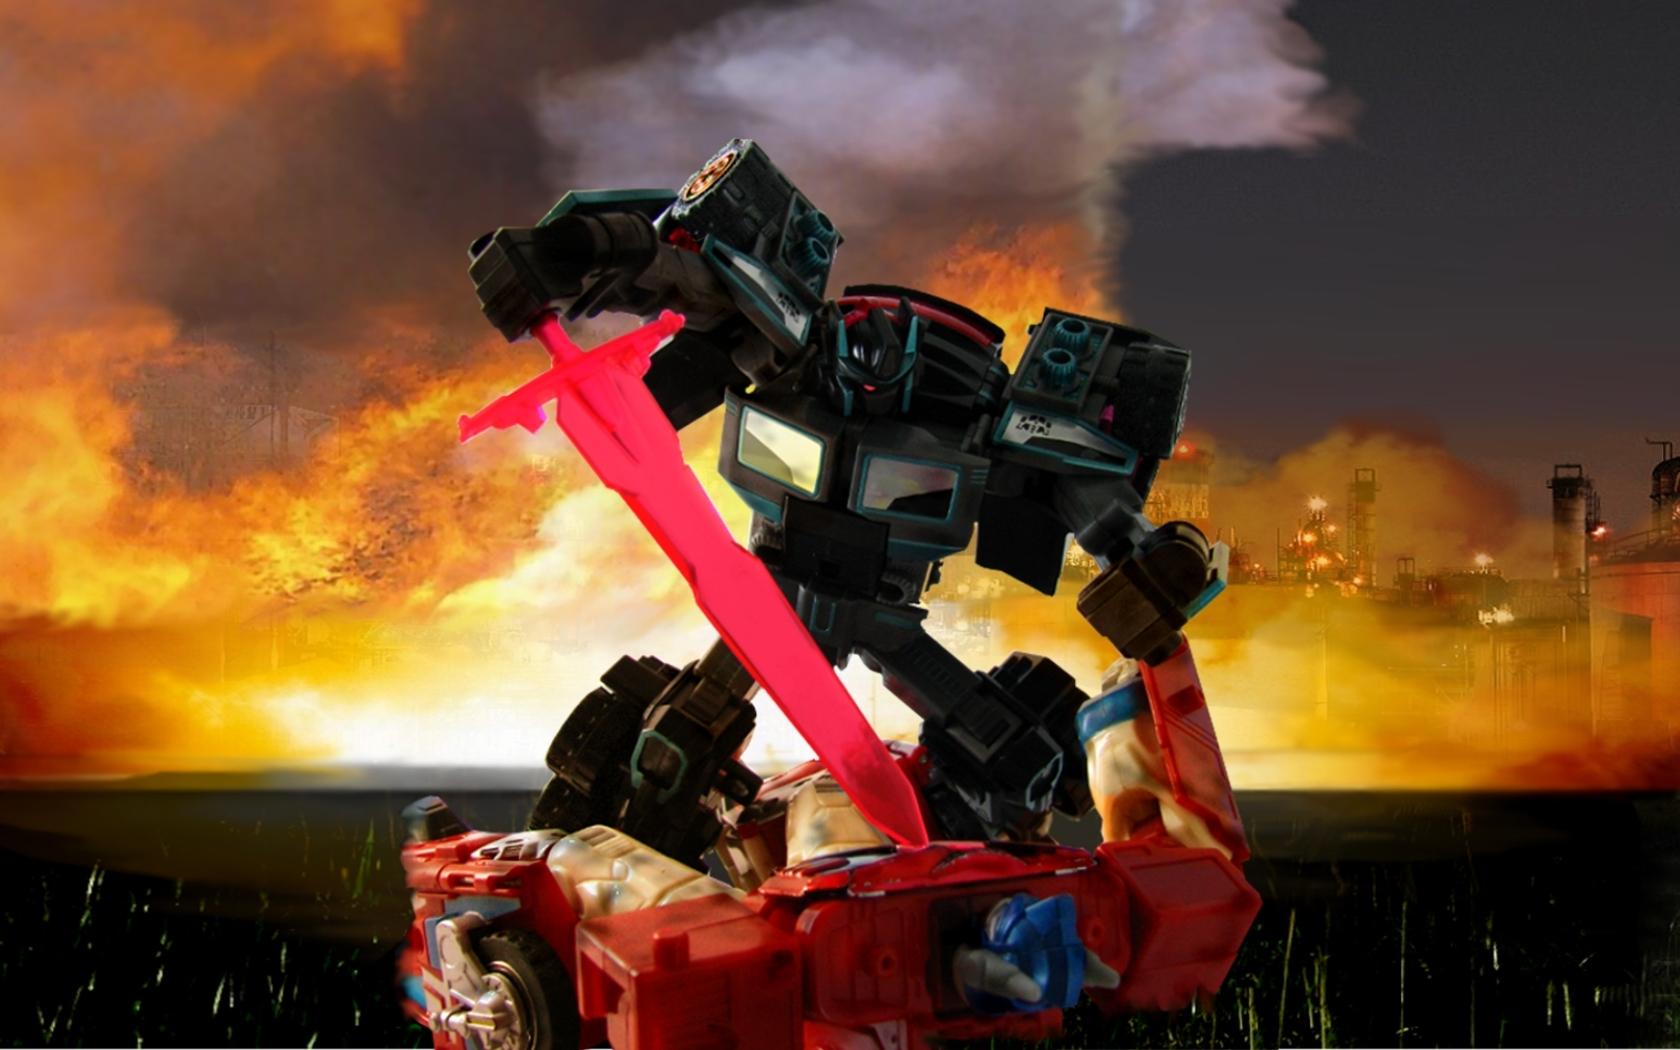 RID Scourge Vs Optimus Prime 1680 x 1050